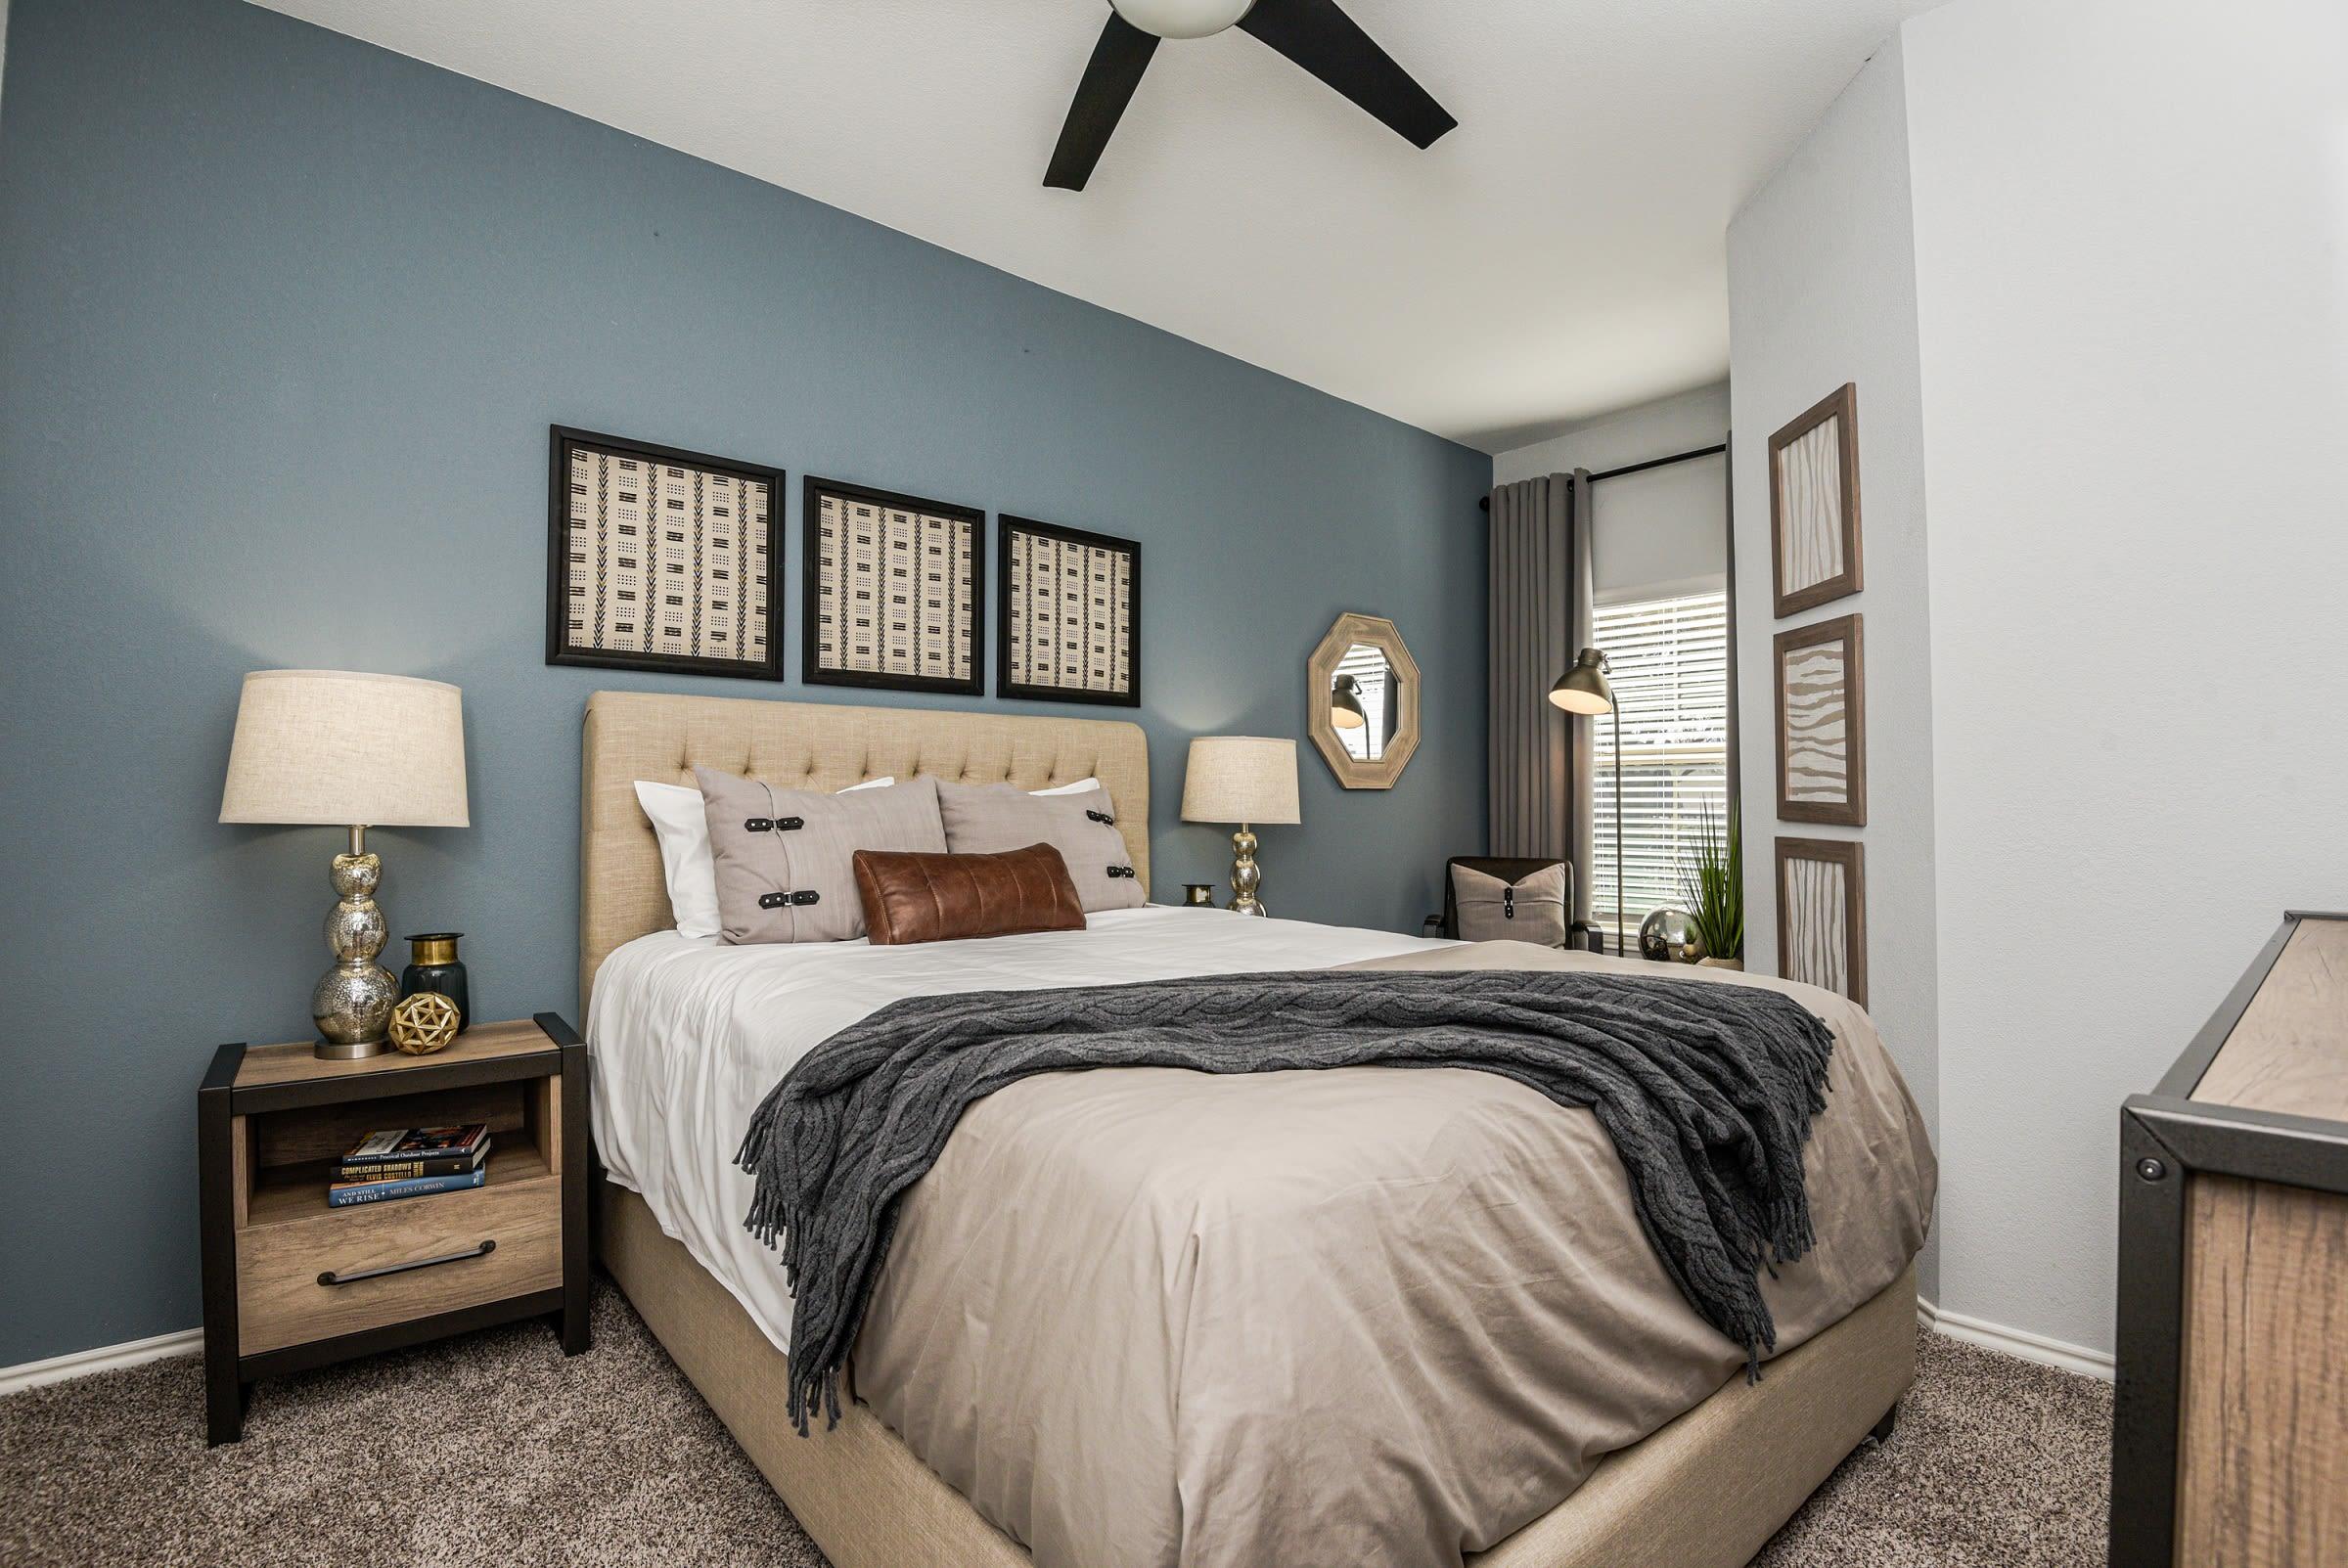 Well decorated model bedroom at Ranch ThreeOFive in Arlington, Texas